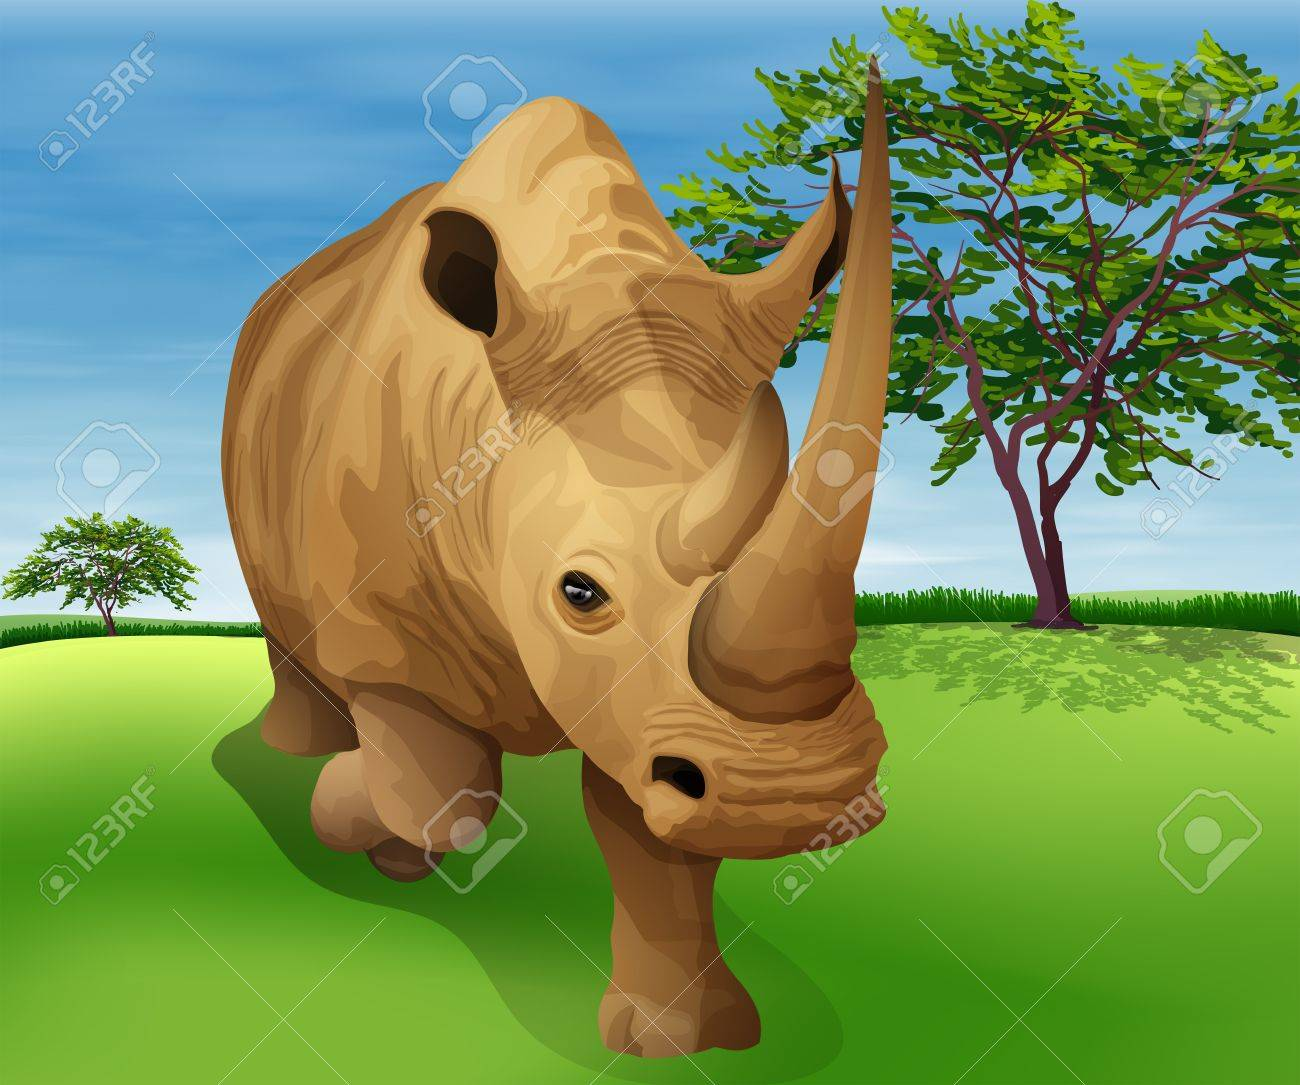 Illustration showing the Rhinoceros Stock Vector - 20774798